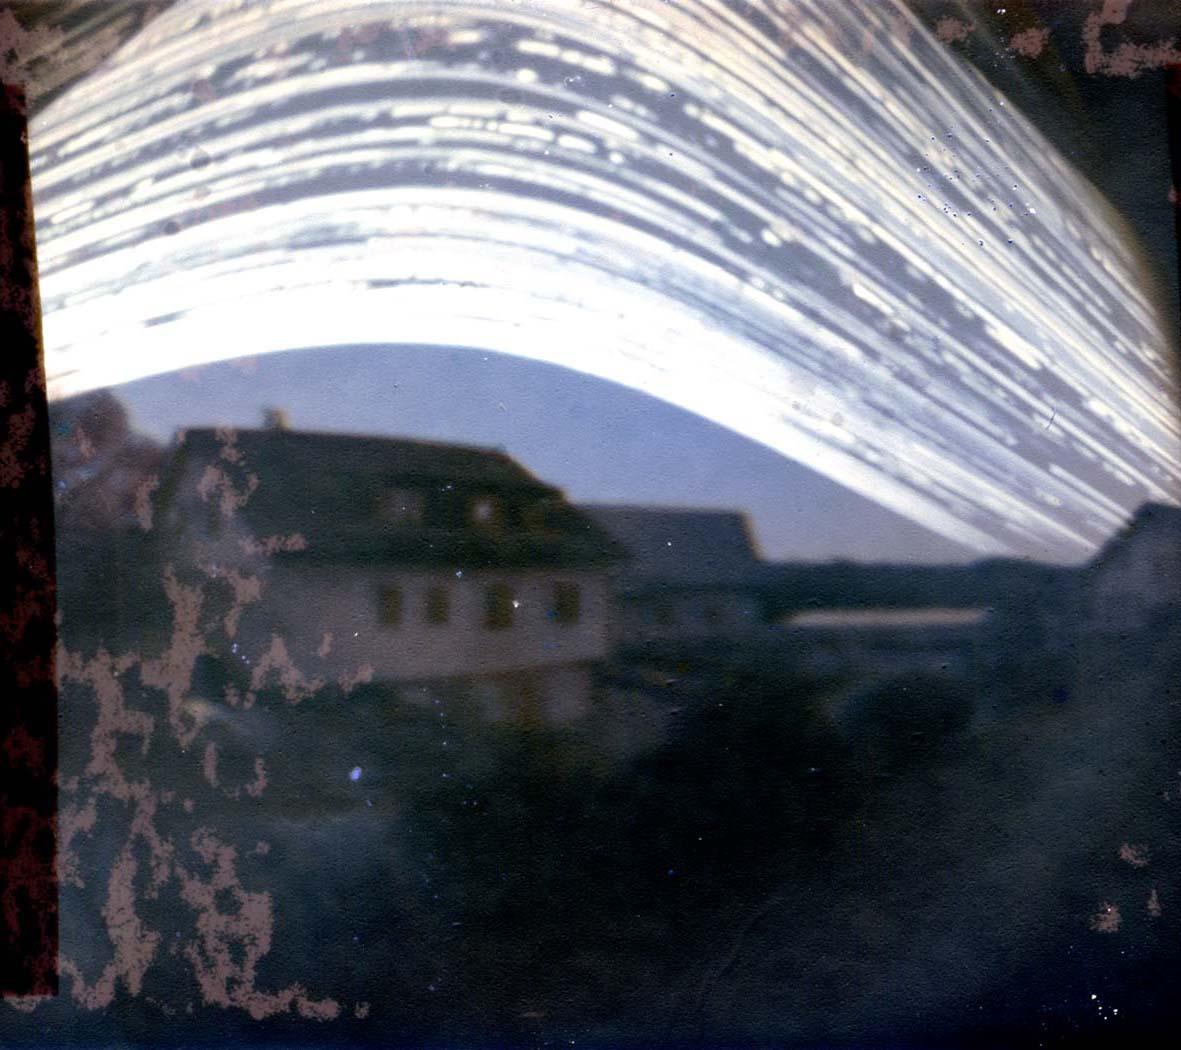 Solargraph 24 web